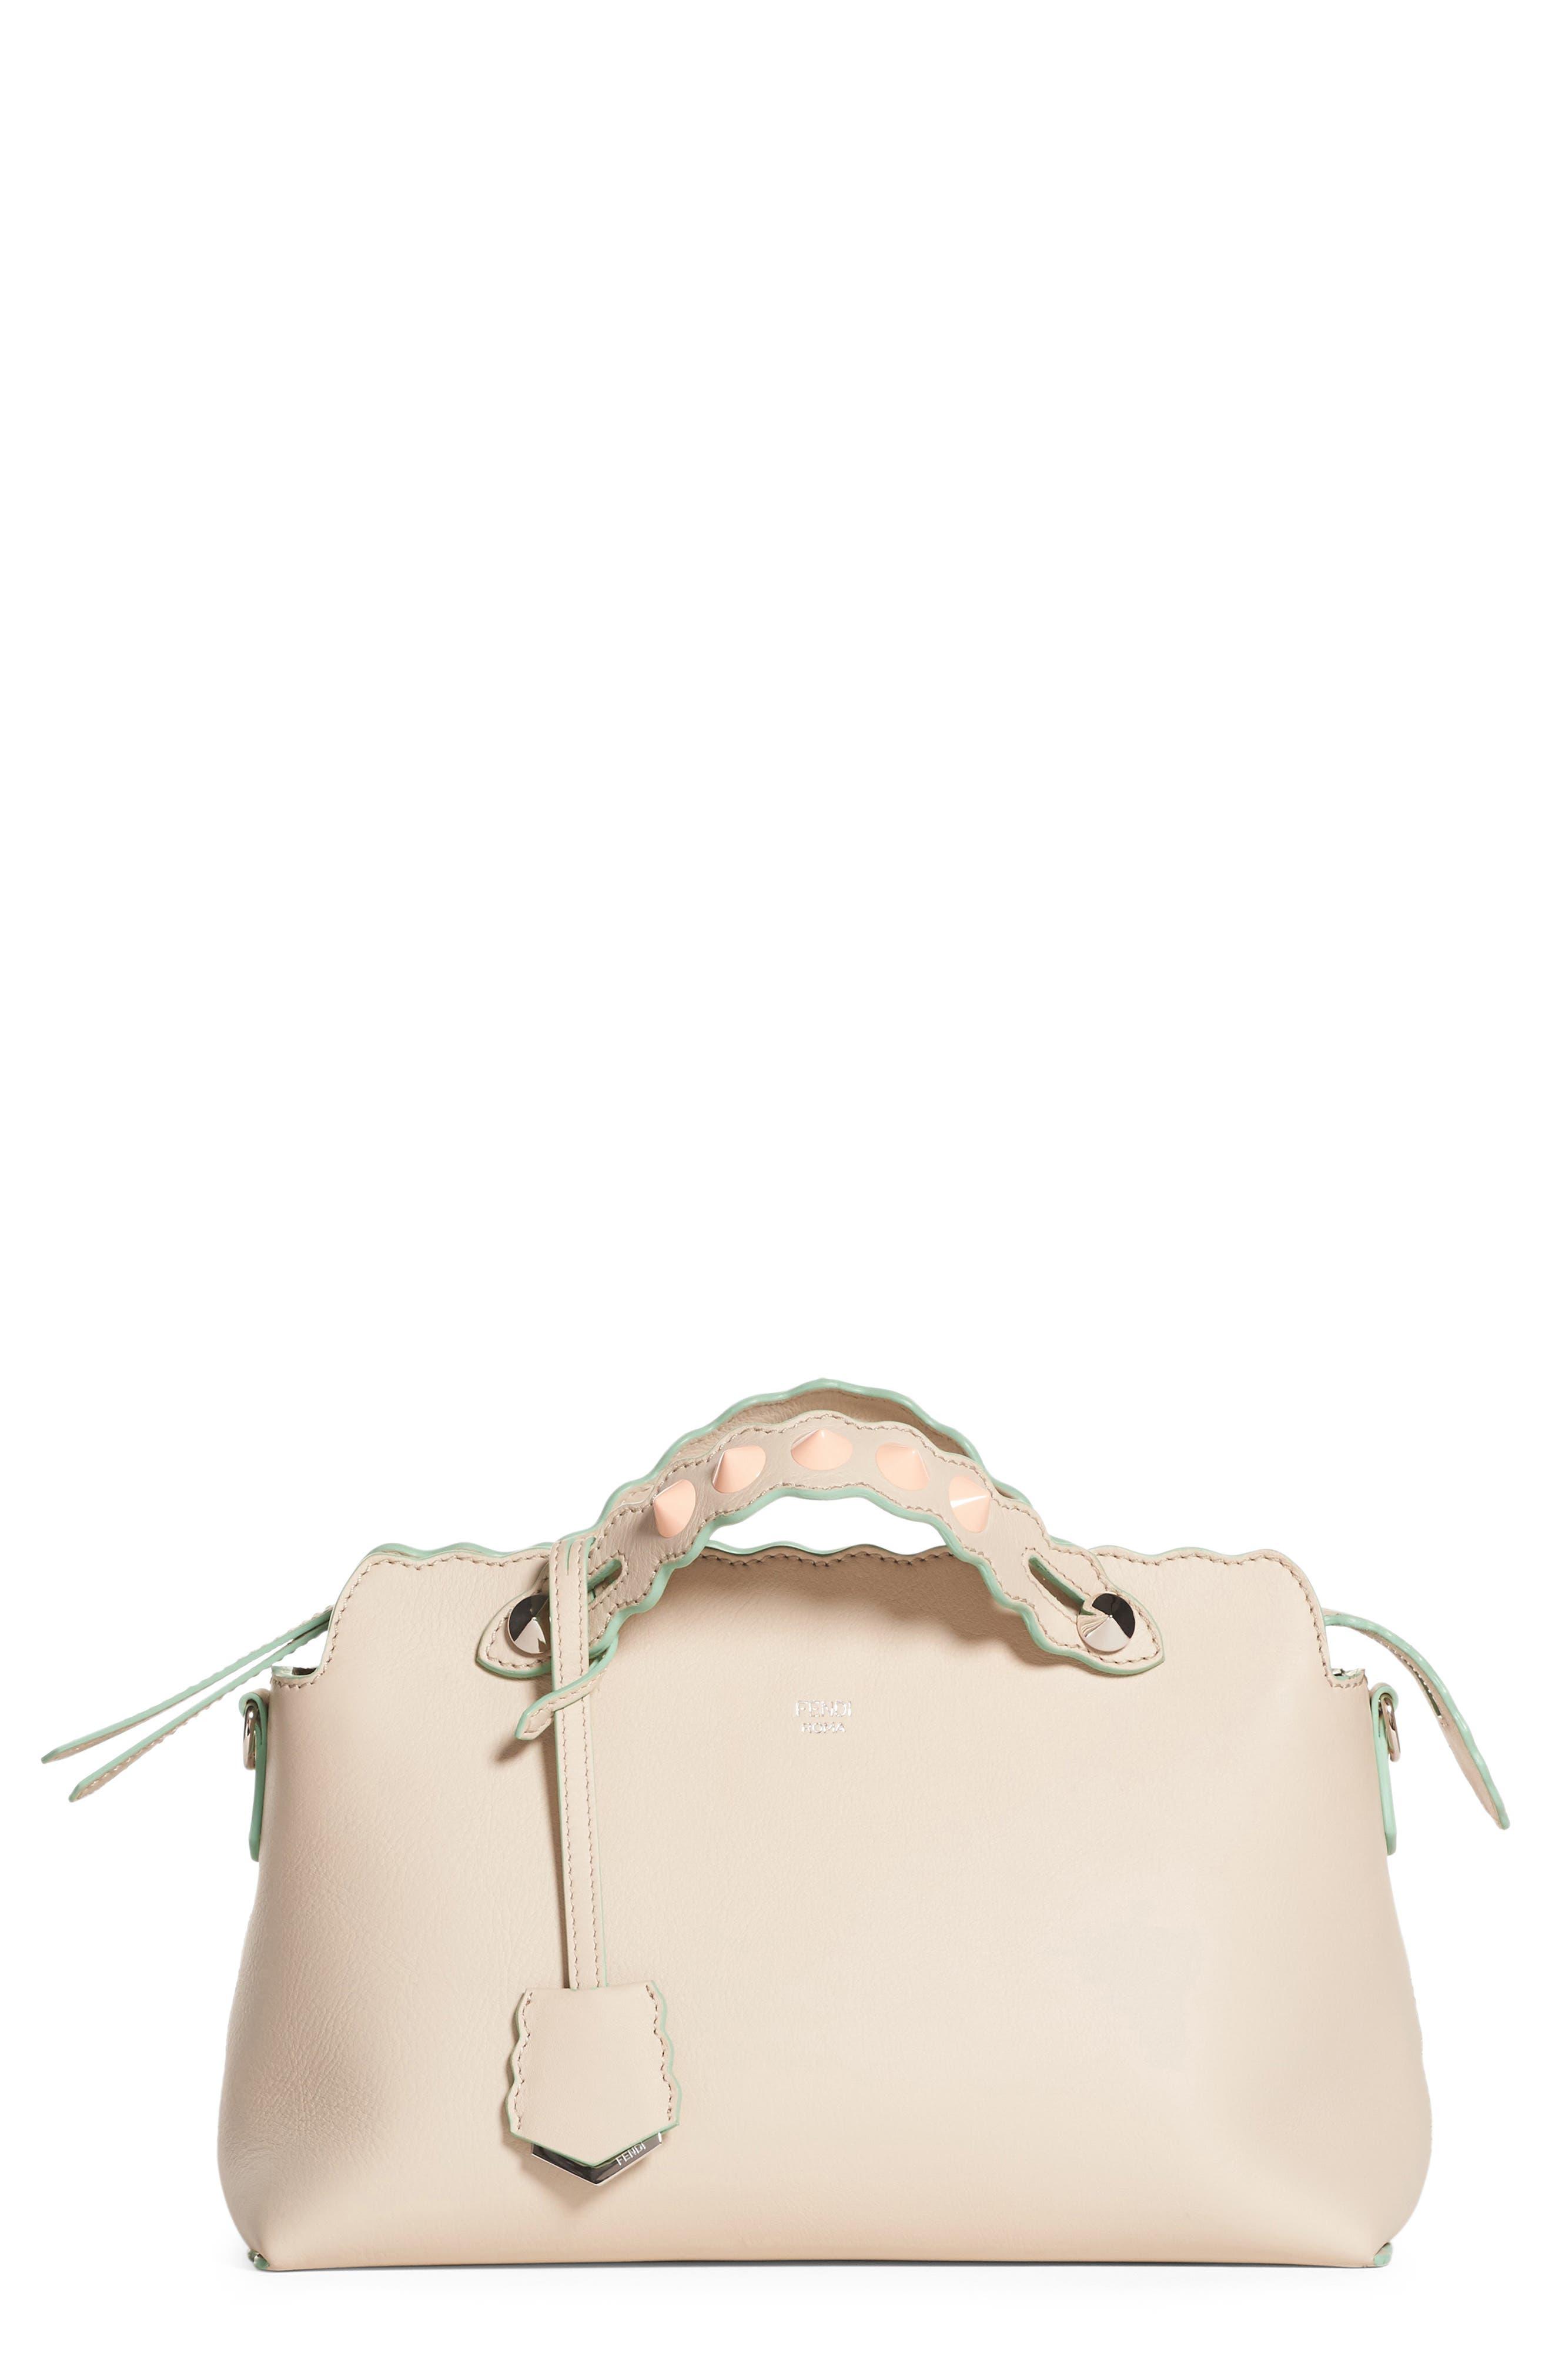 Alternate Image 1 Selected - Fendi Medium By The Way Leather Shoulder Bag